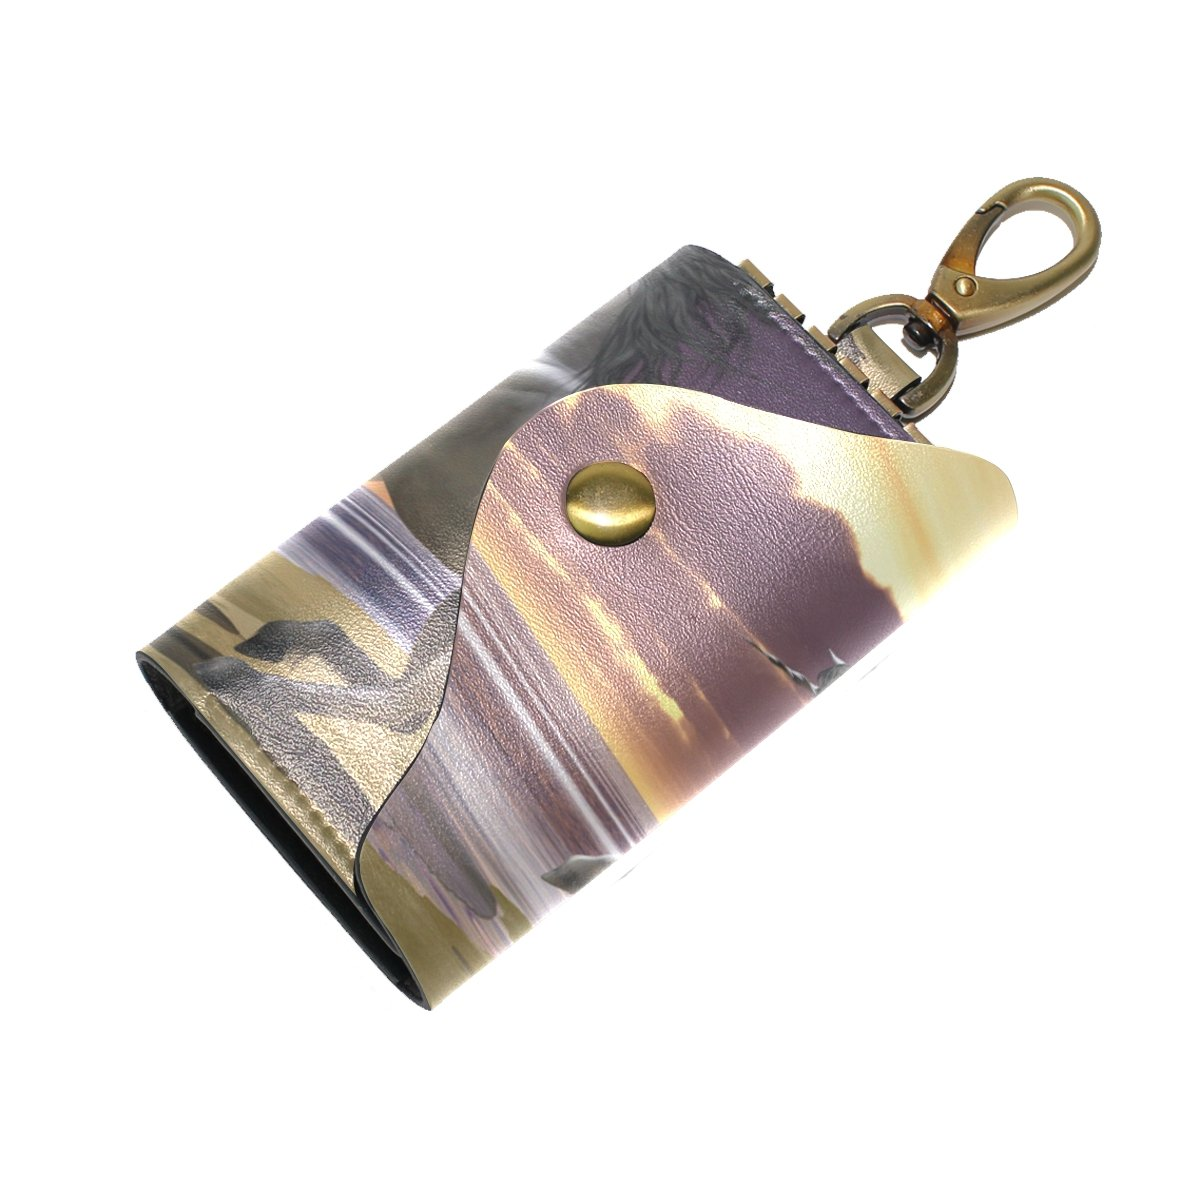 KEAKIA Playing Unicorns Leather Key Case Wallets Tri-fold Key Holder Keychains with 6 Hooks 2 Slot Snap Closure for Men Women